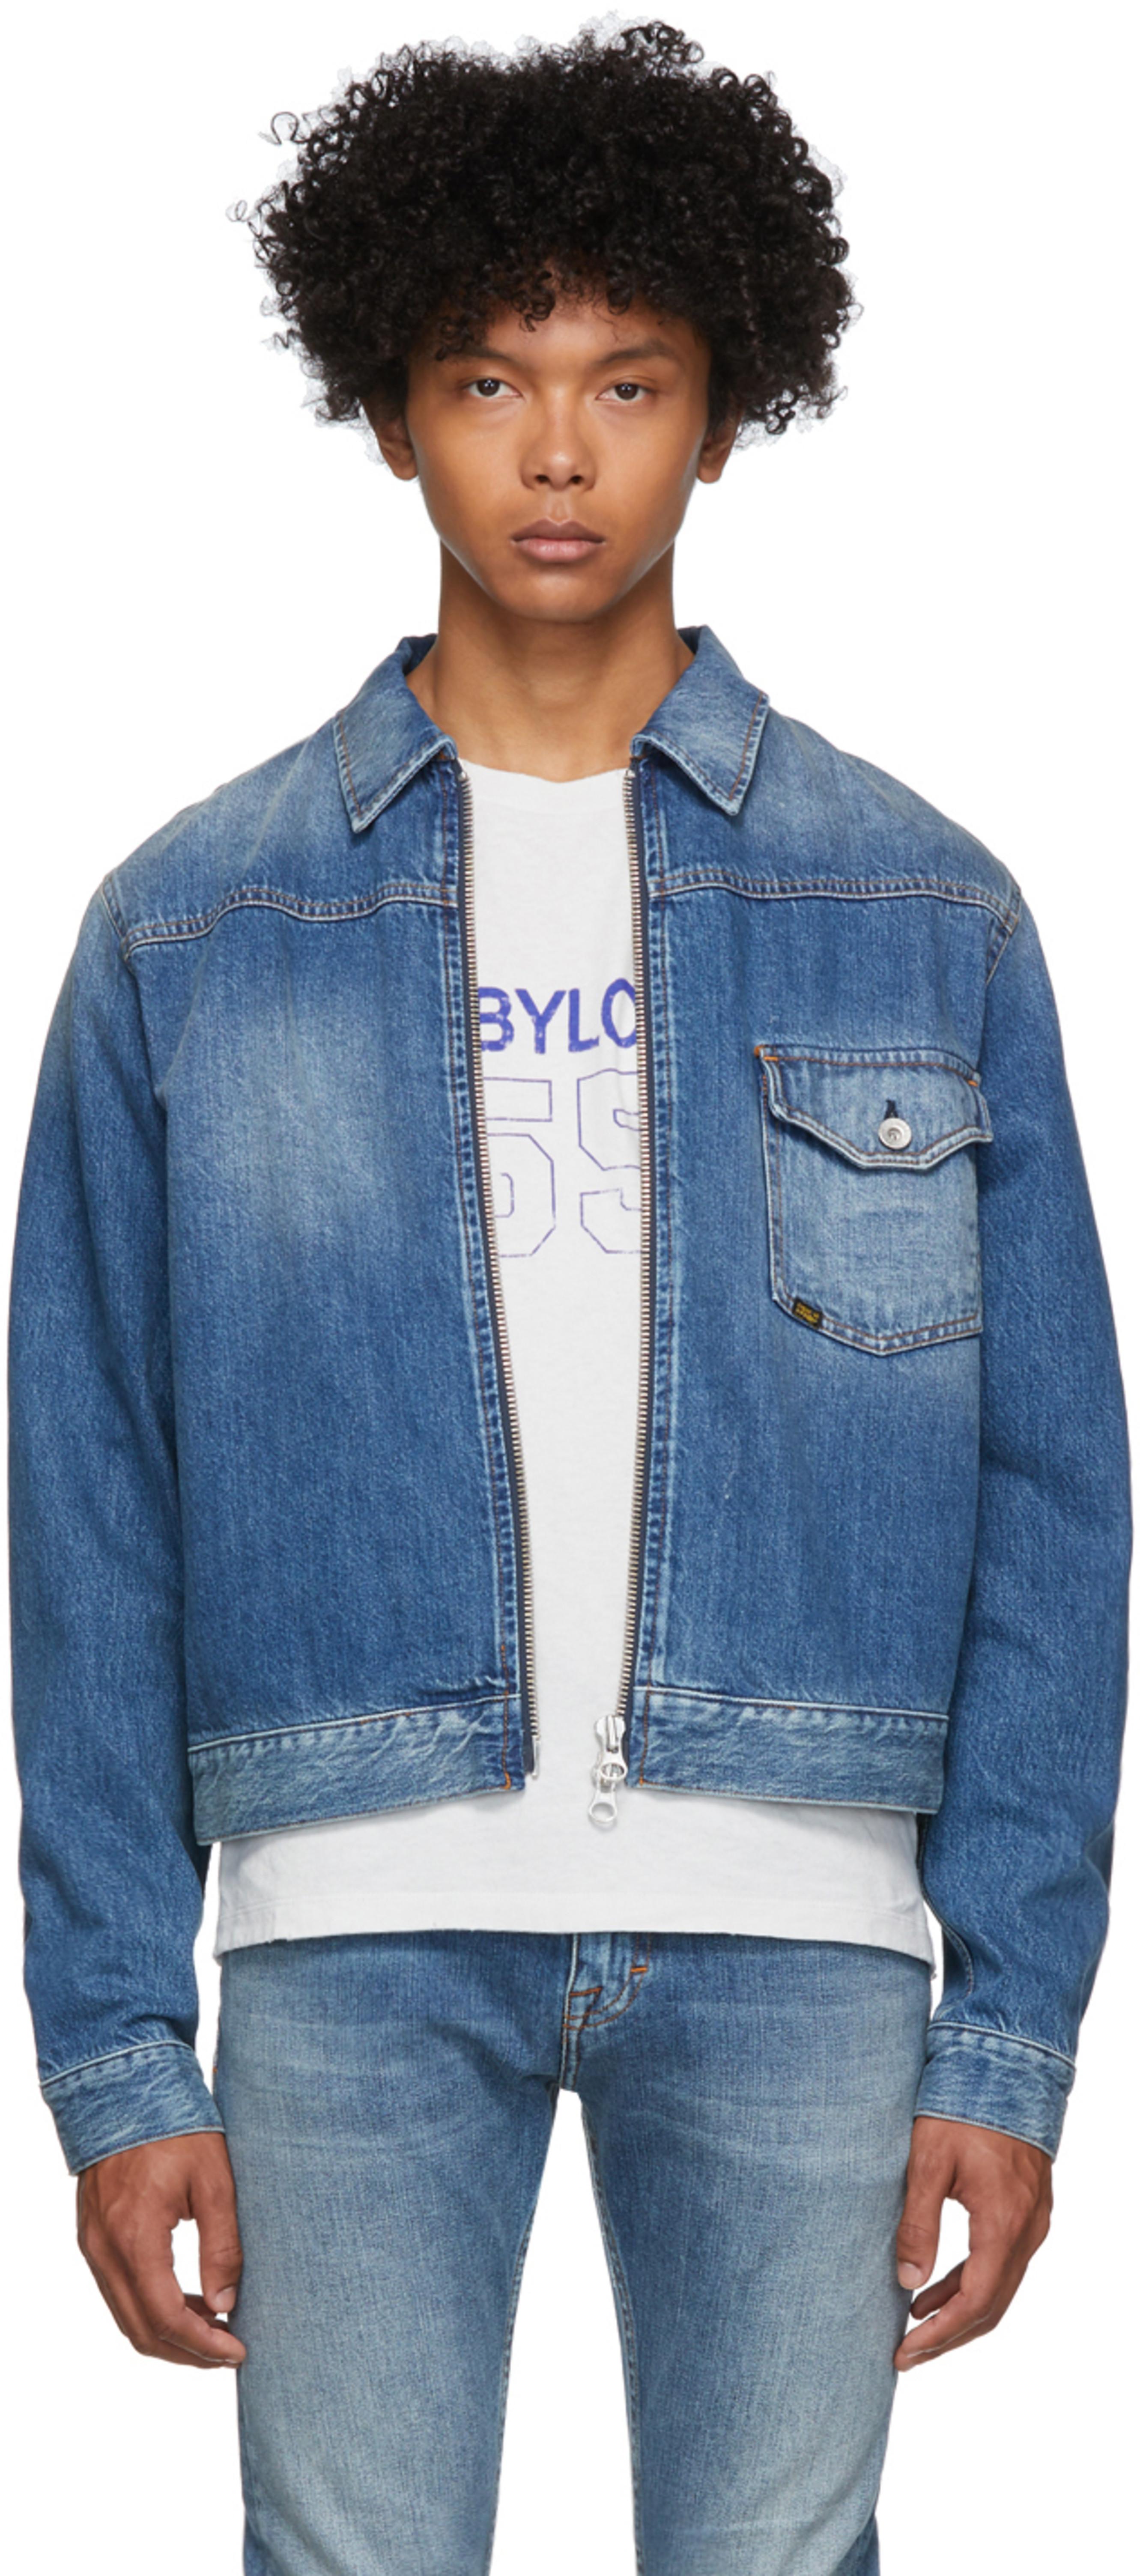 3a9e86982 Blue Denim Ry Zip Jacket